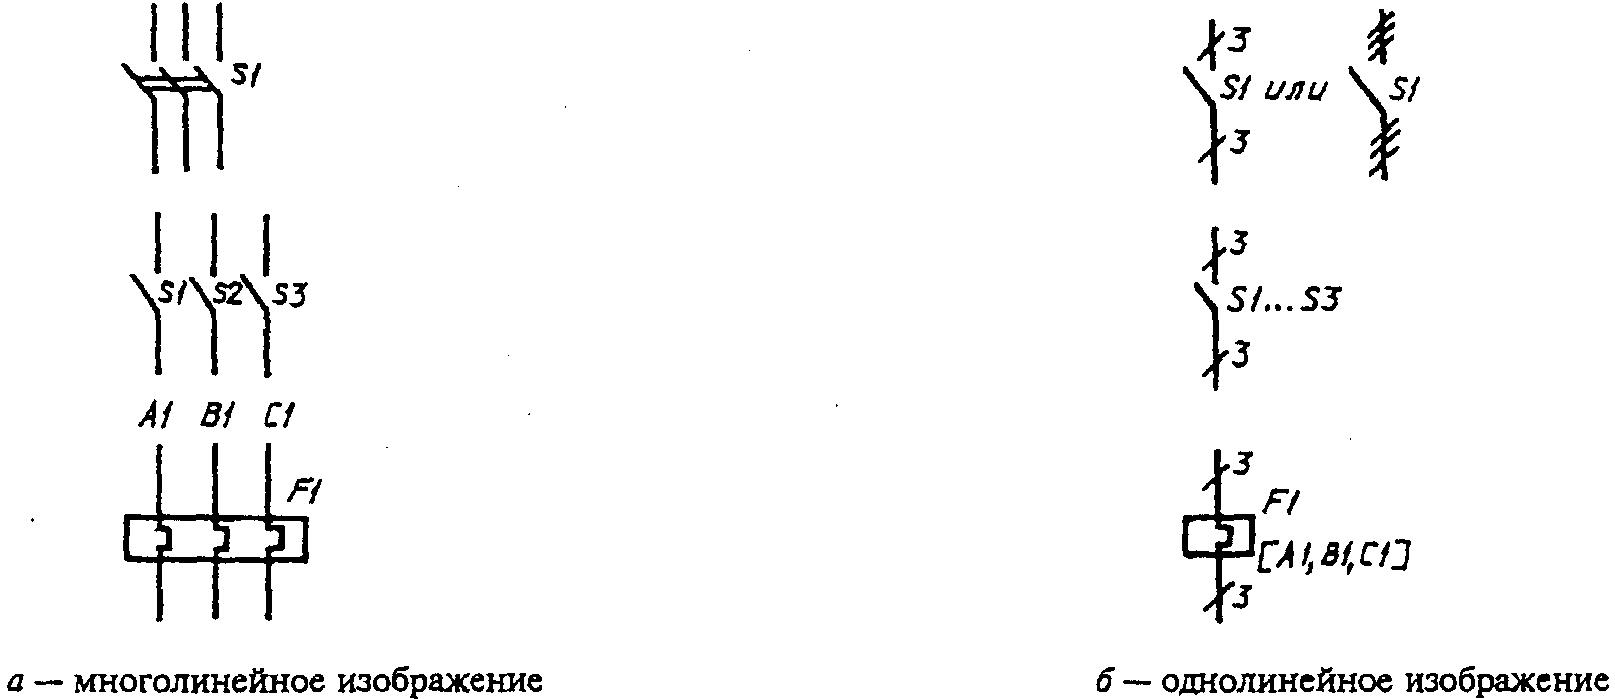 Гост 2 702 75 единая система конструкторской документации lt b gt lt b gt